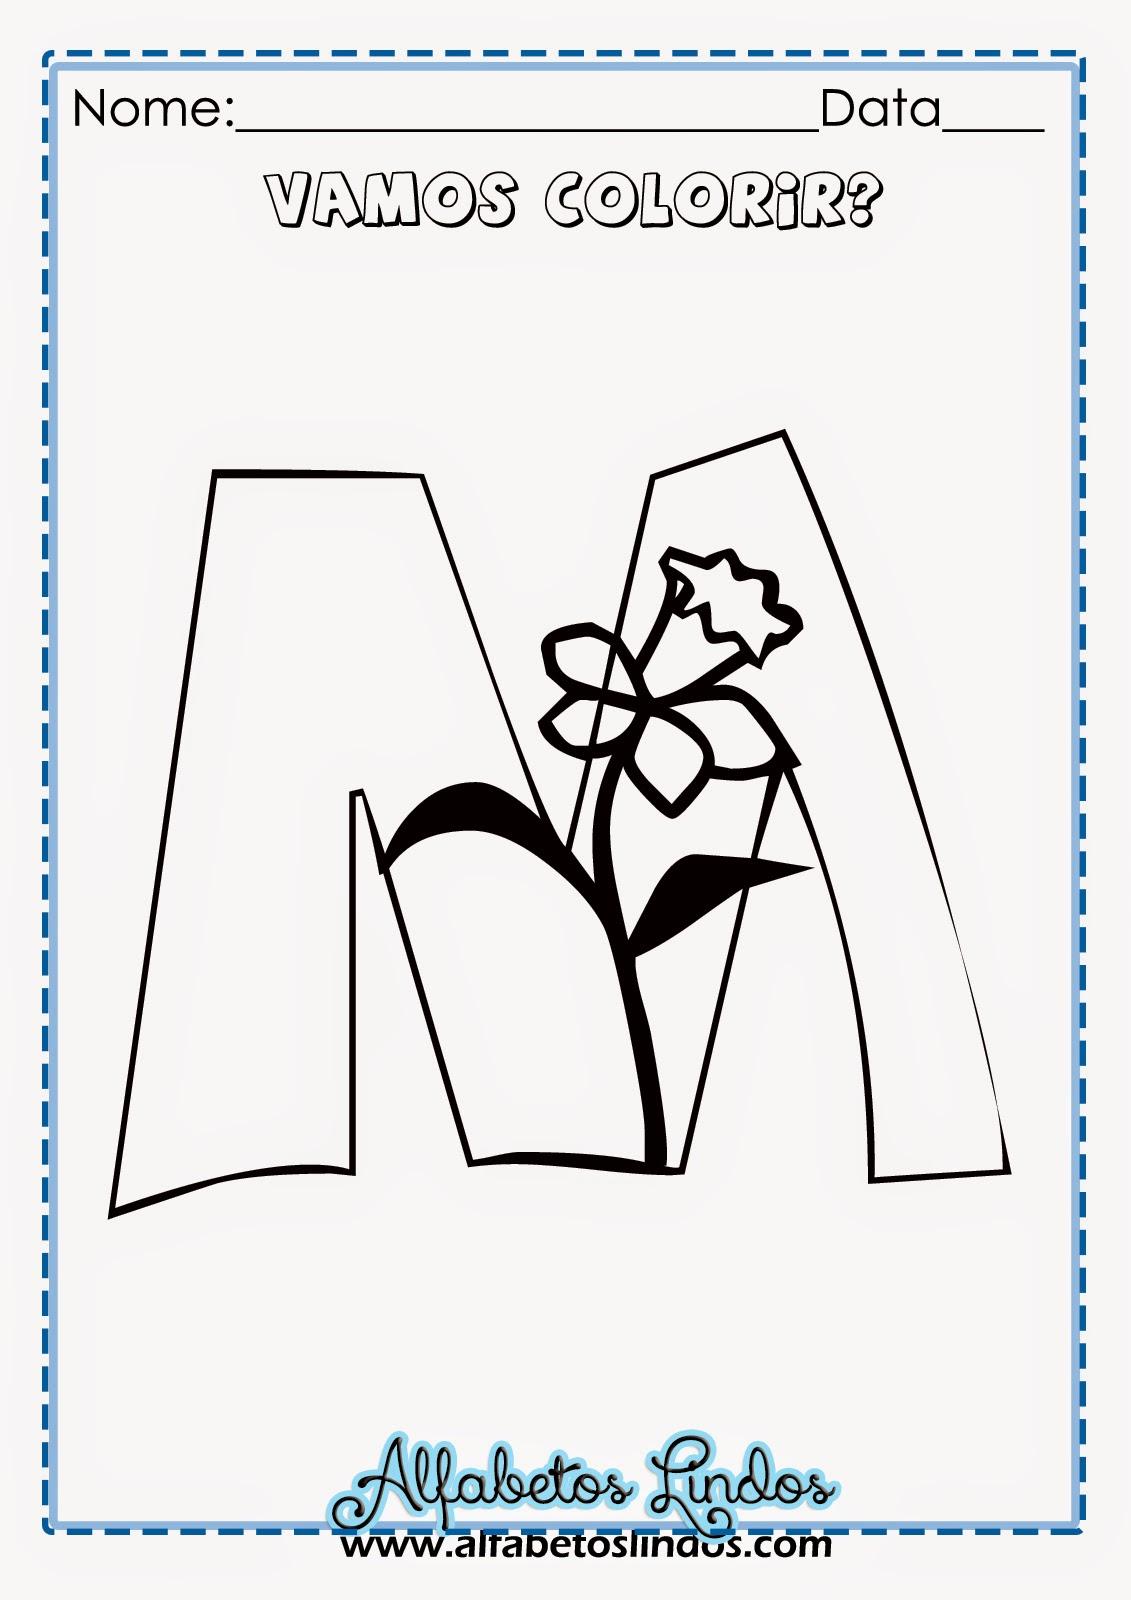 Do Letras Imprimir Para Alfabeto